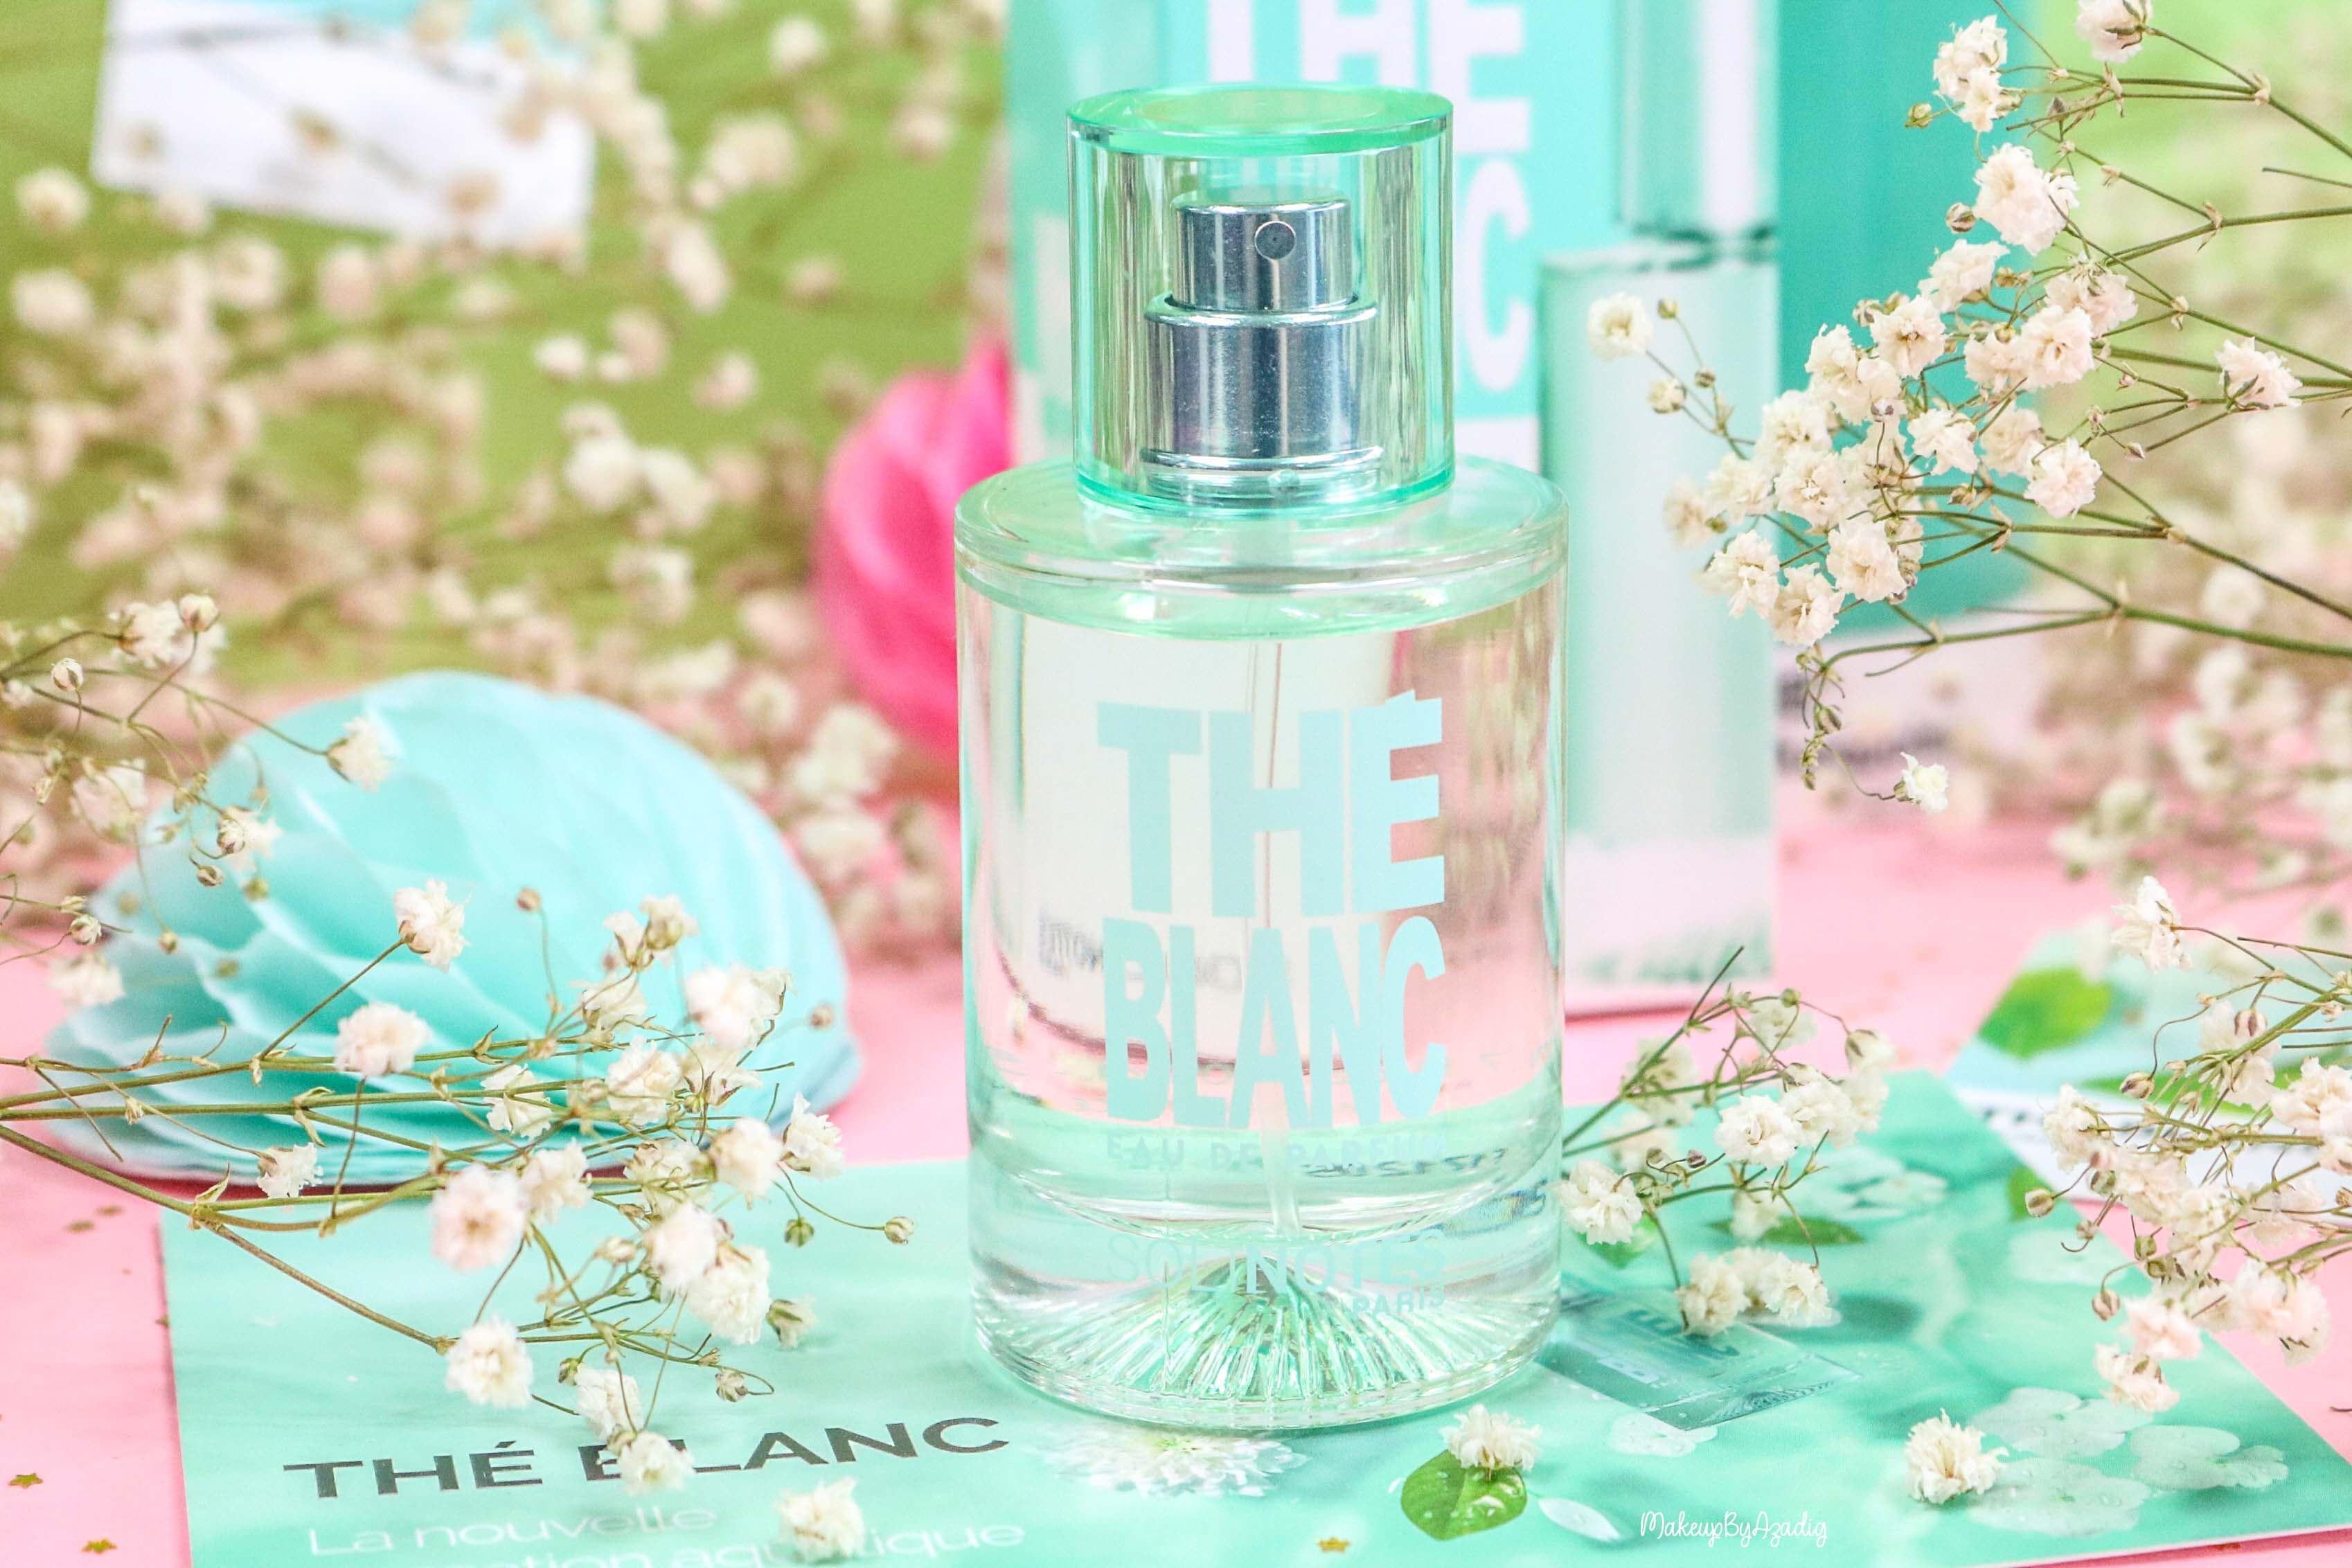 revue-parfum-solinotes-sephora-monoprix-the-blanc-vanille-oranger-prix-pas-cher-promo-makeupbyazadig-gypsophile